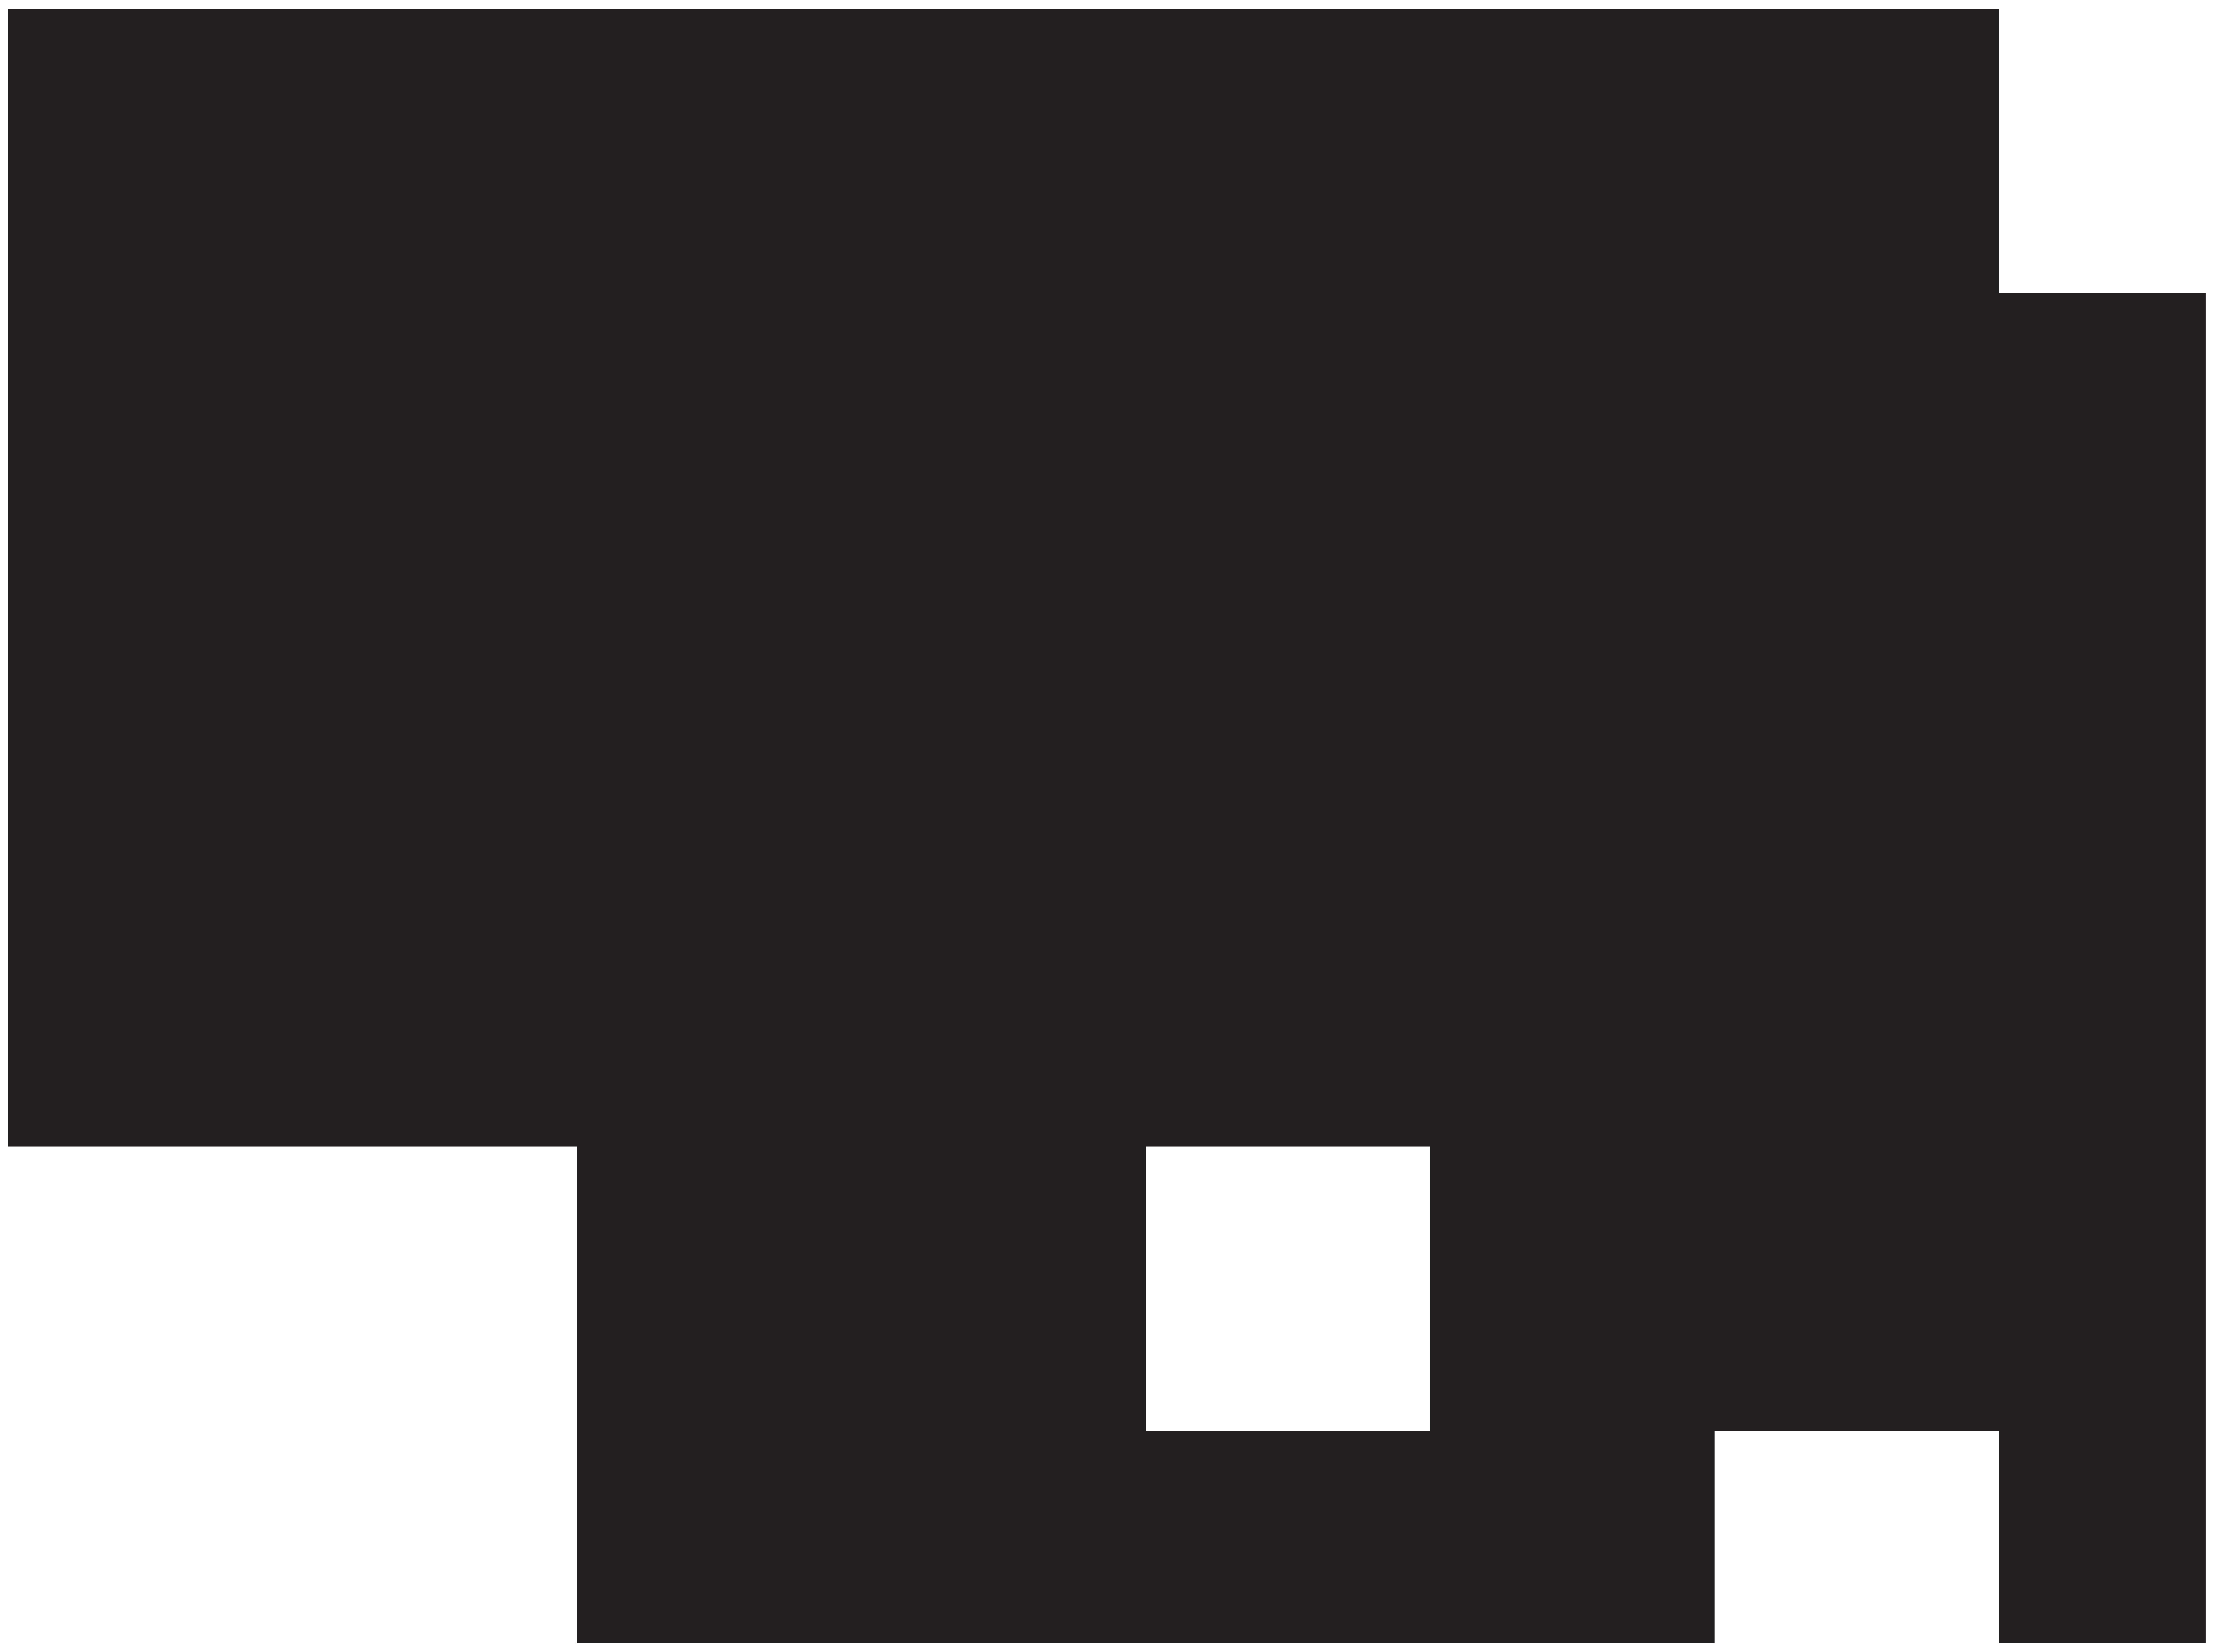 8000x5948 Camel Silhouette Png Clip Art Imageu200b Gallery Yopriceville